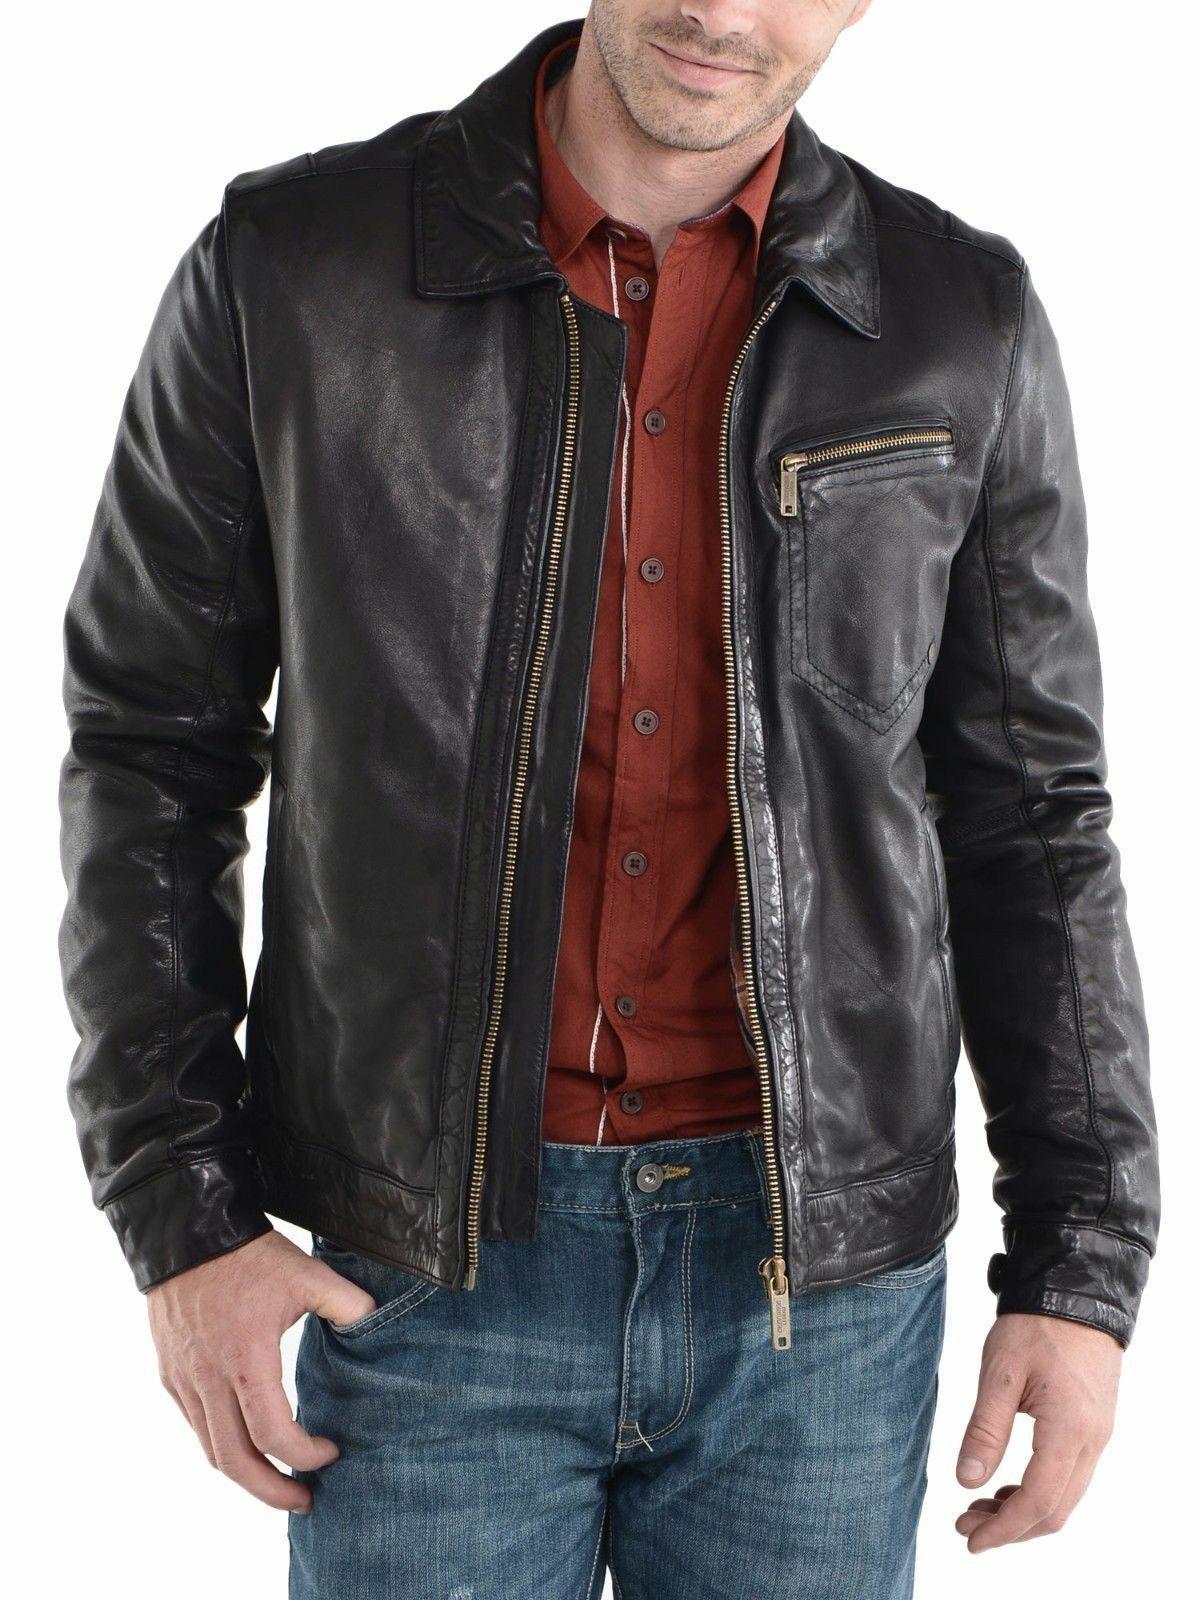 Mens Retro Black Slim autumn winter warm Genuine Leather Motorcycle Jacket motorcycle leather